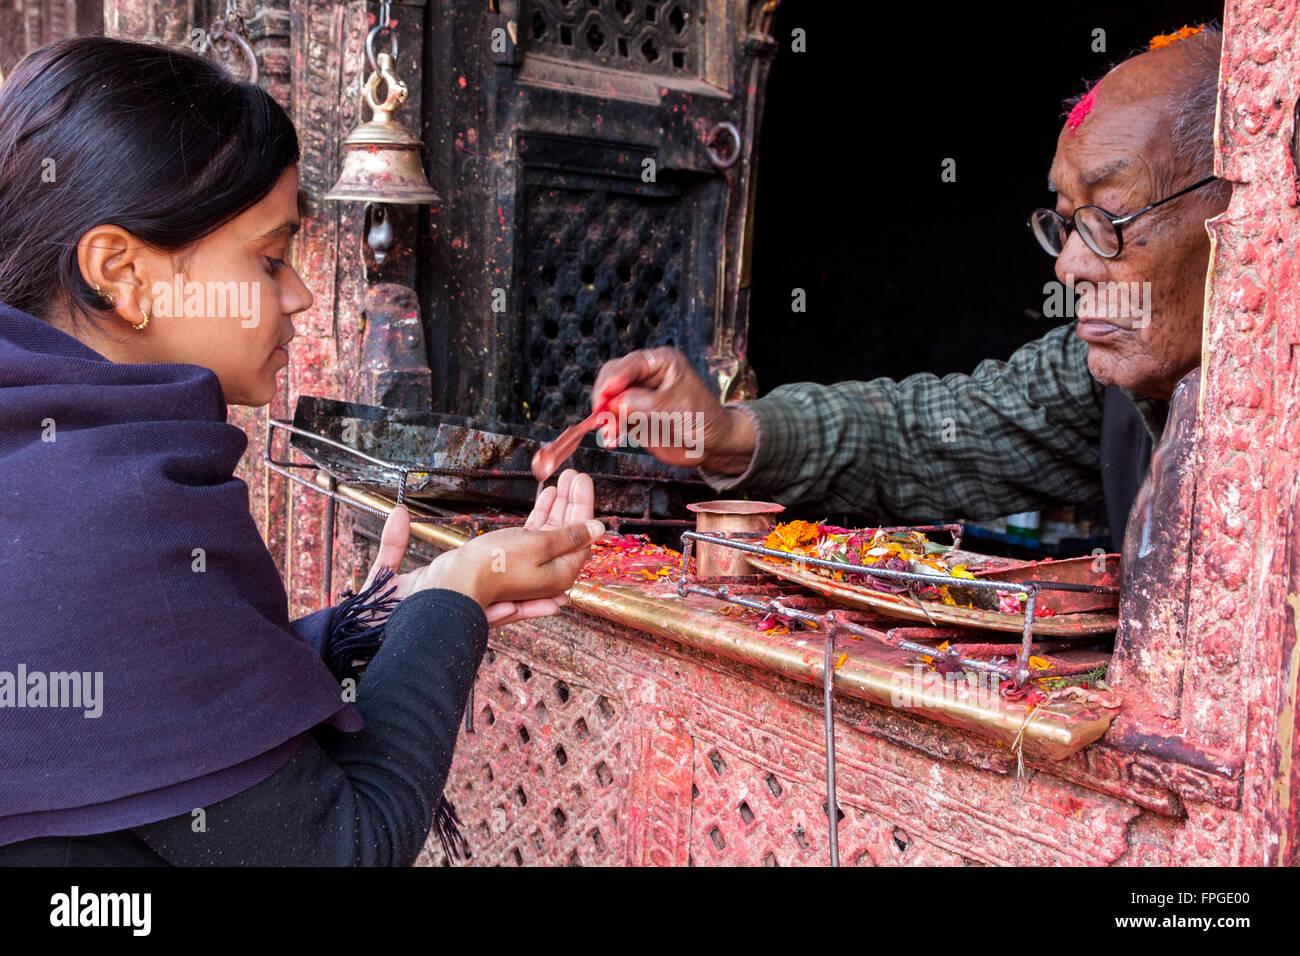 Nepal, Patan.  Female Worshiper Receiving Red Kumkuma (Sindoor) Powder at a Hindu Temple. - Stock Image